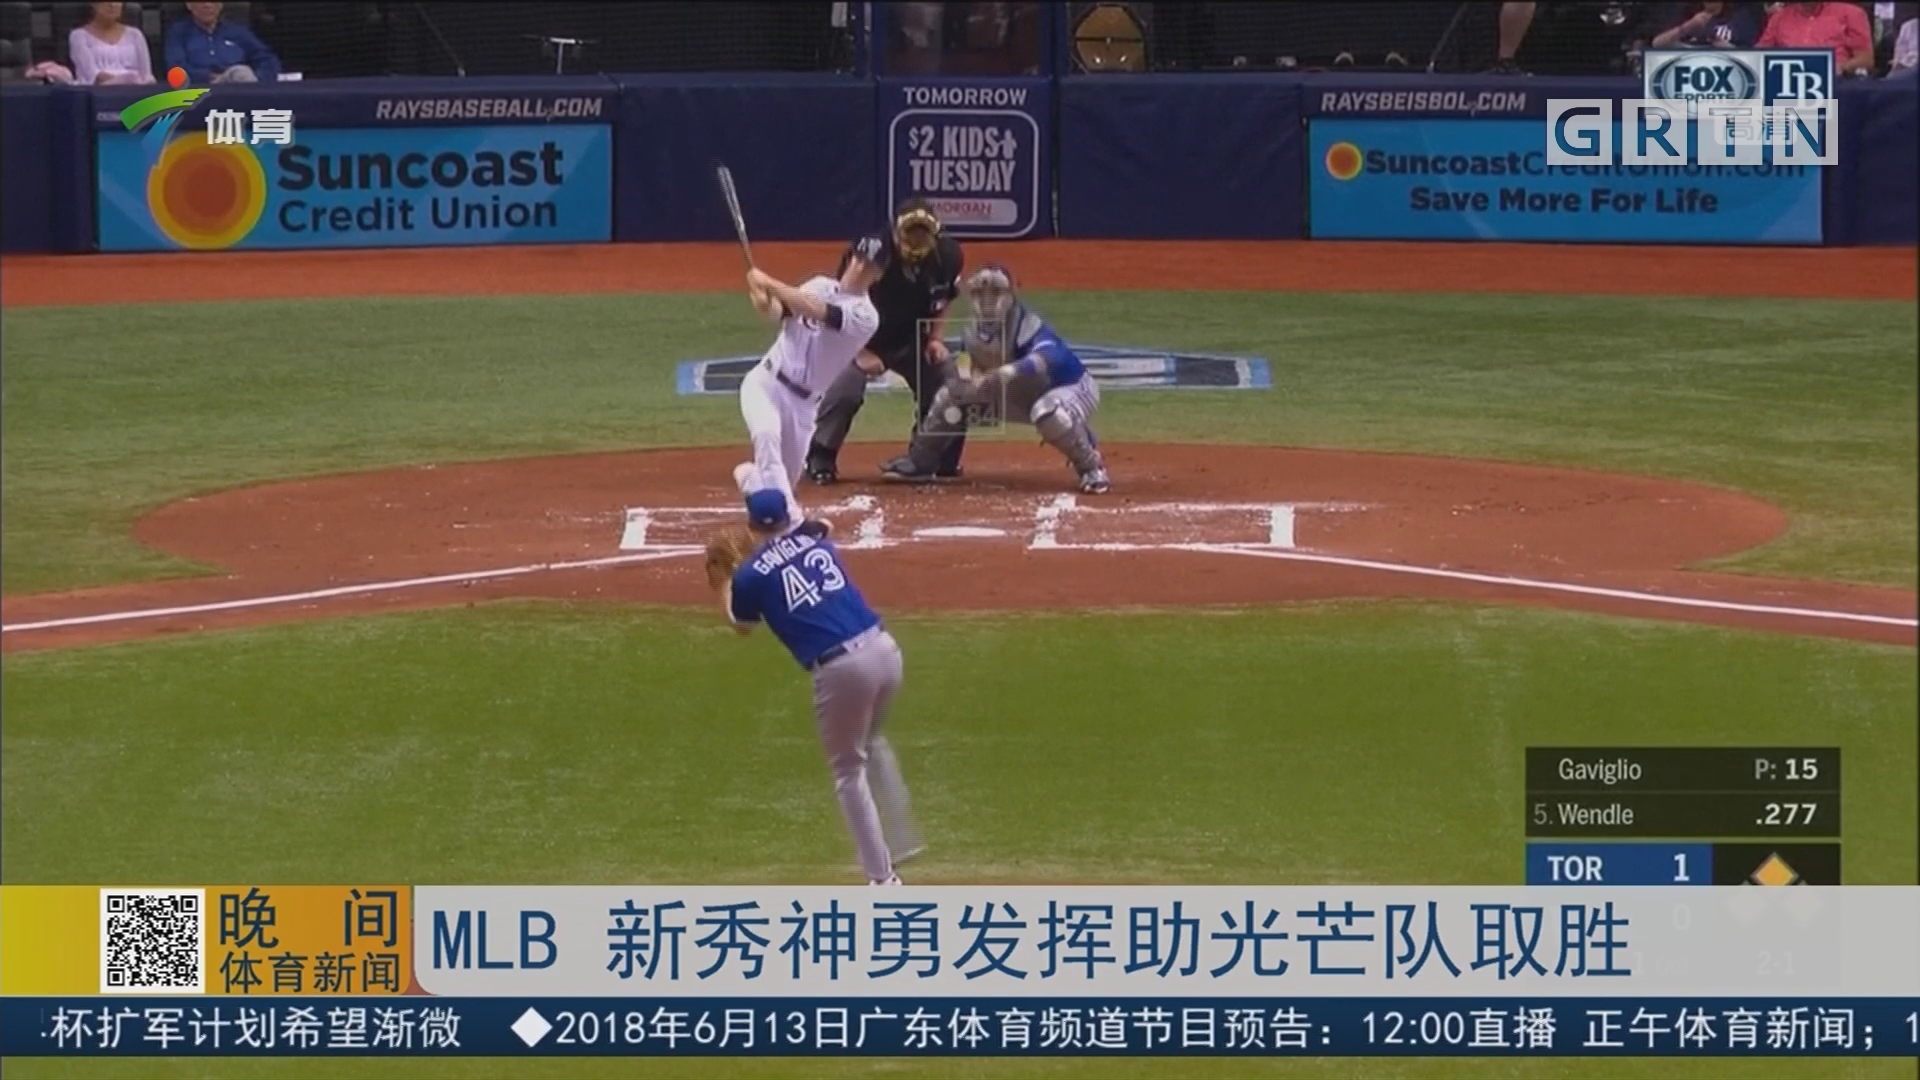 MLB 新秀神勇发挥助光芒队取胜